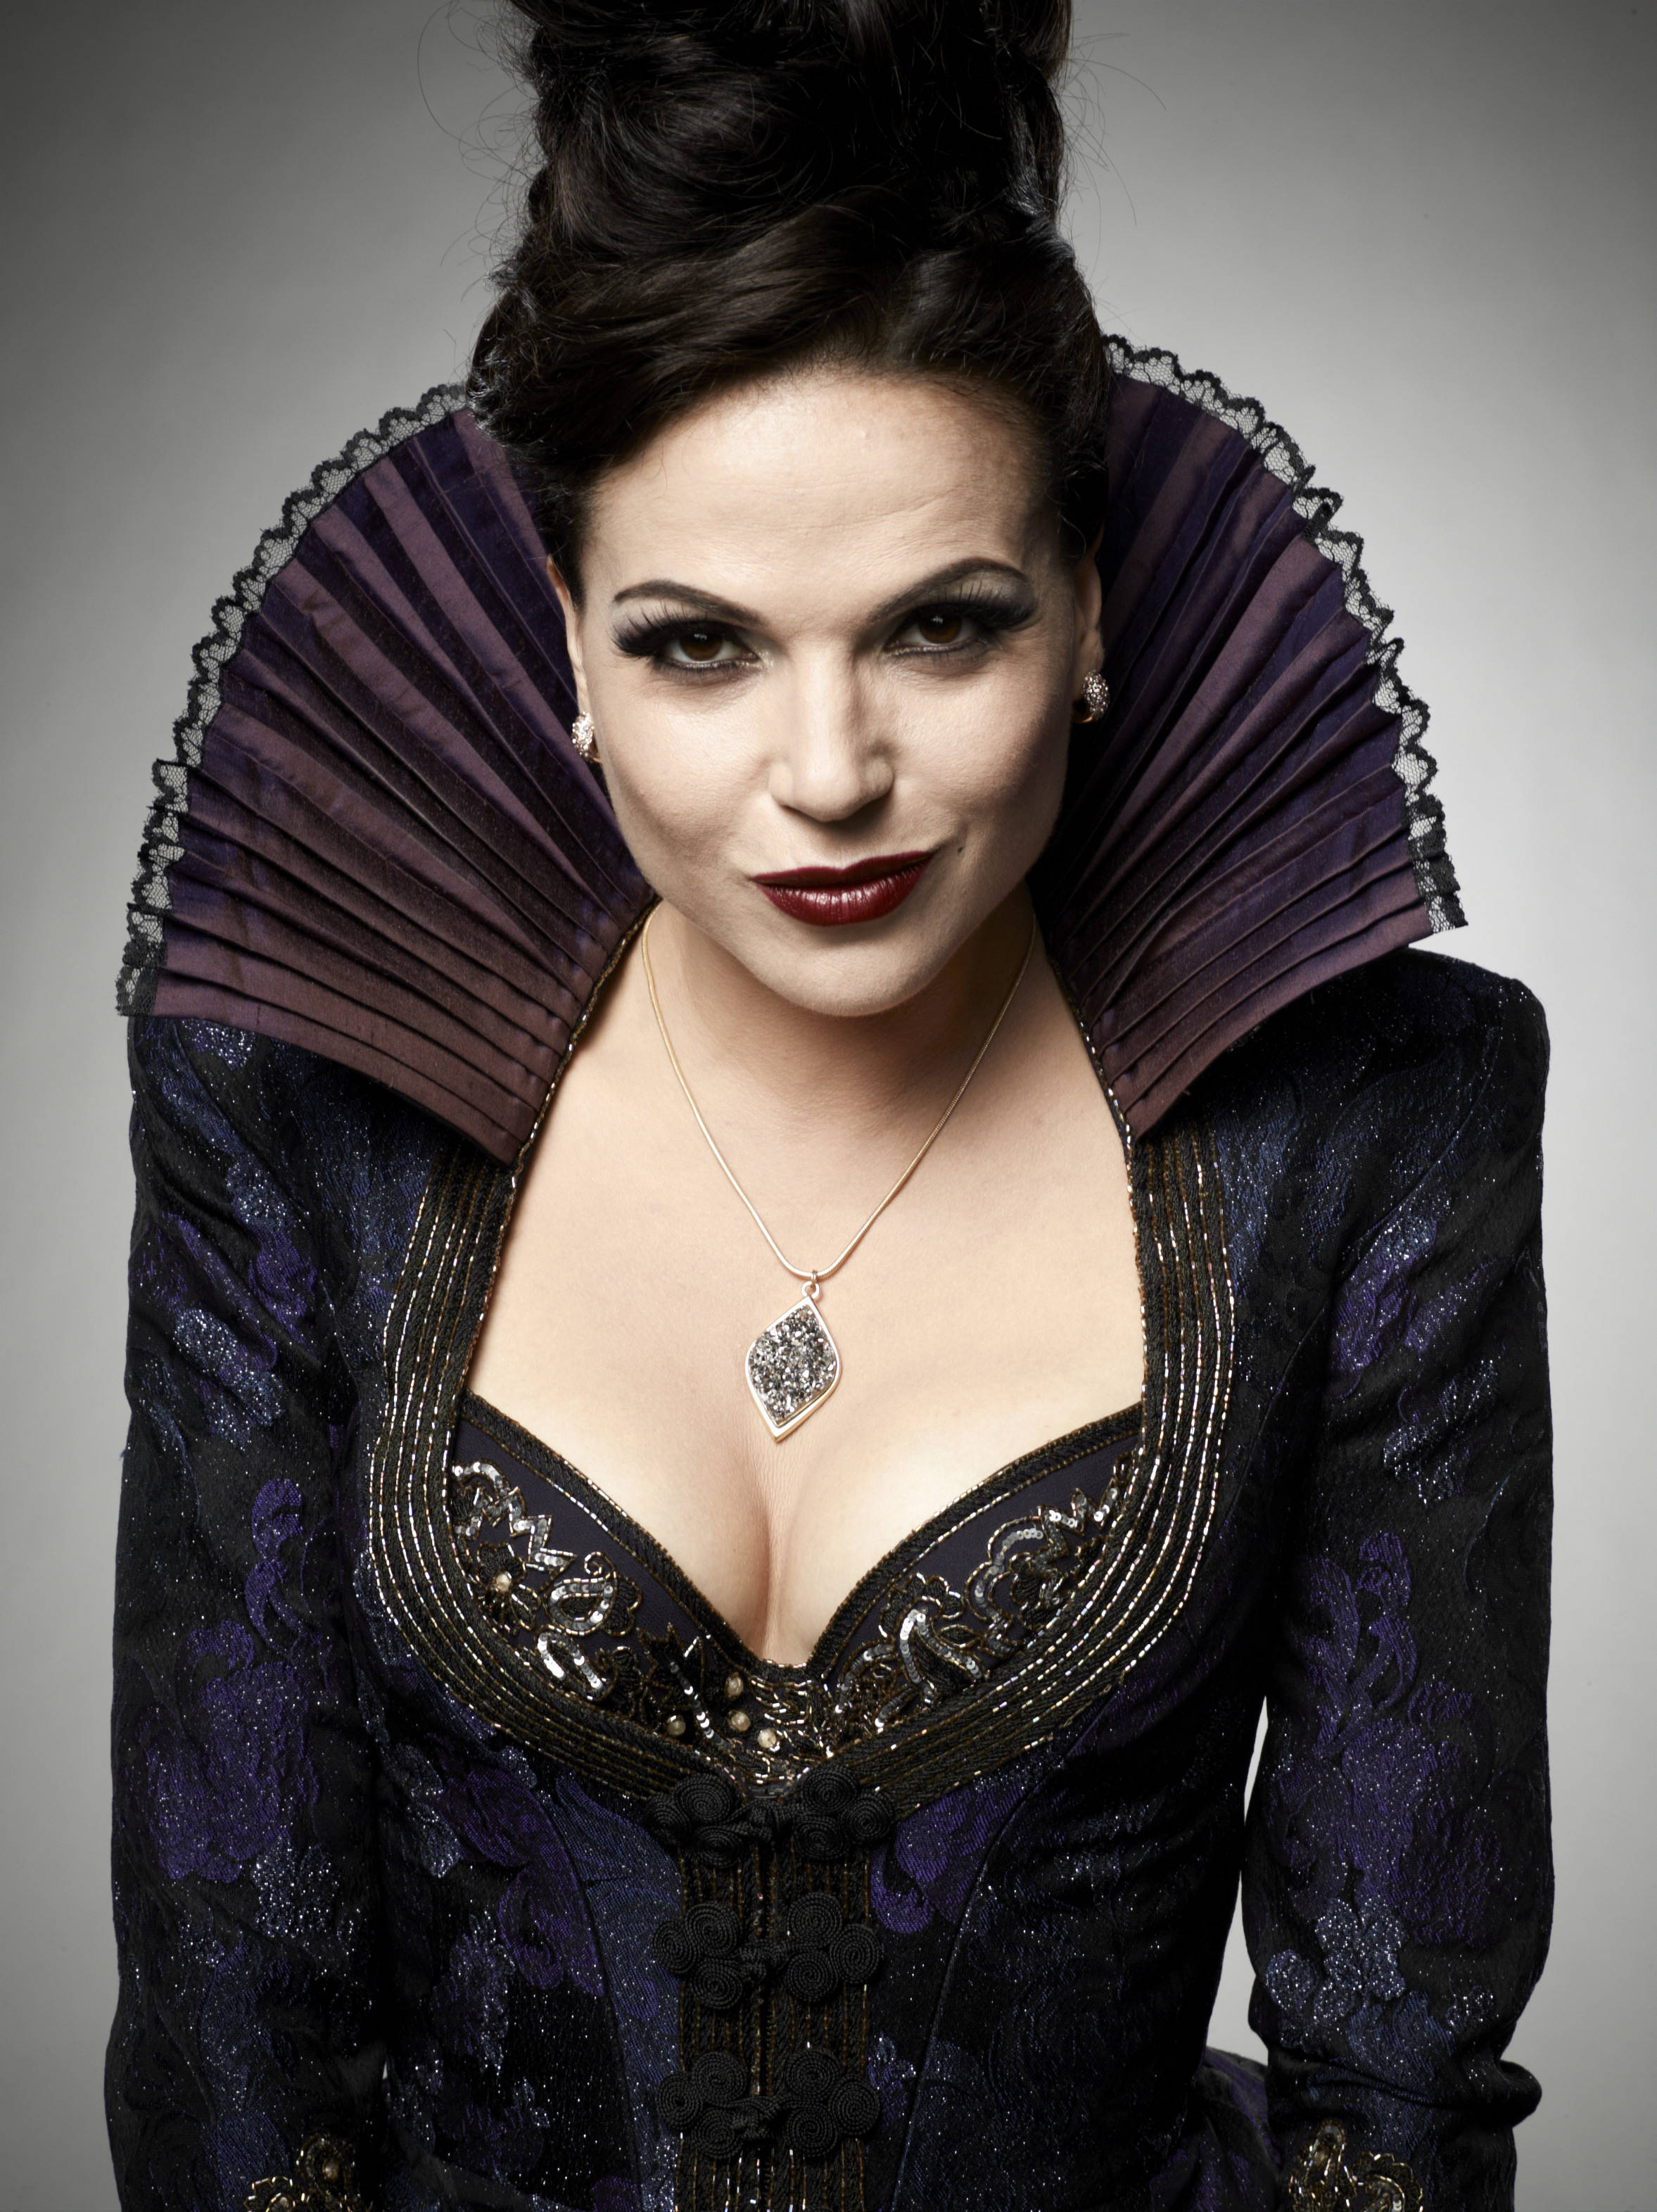 Image result for regina once upon a time images